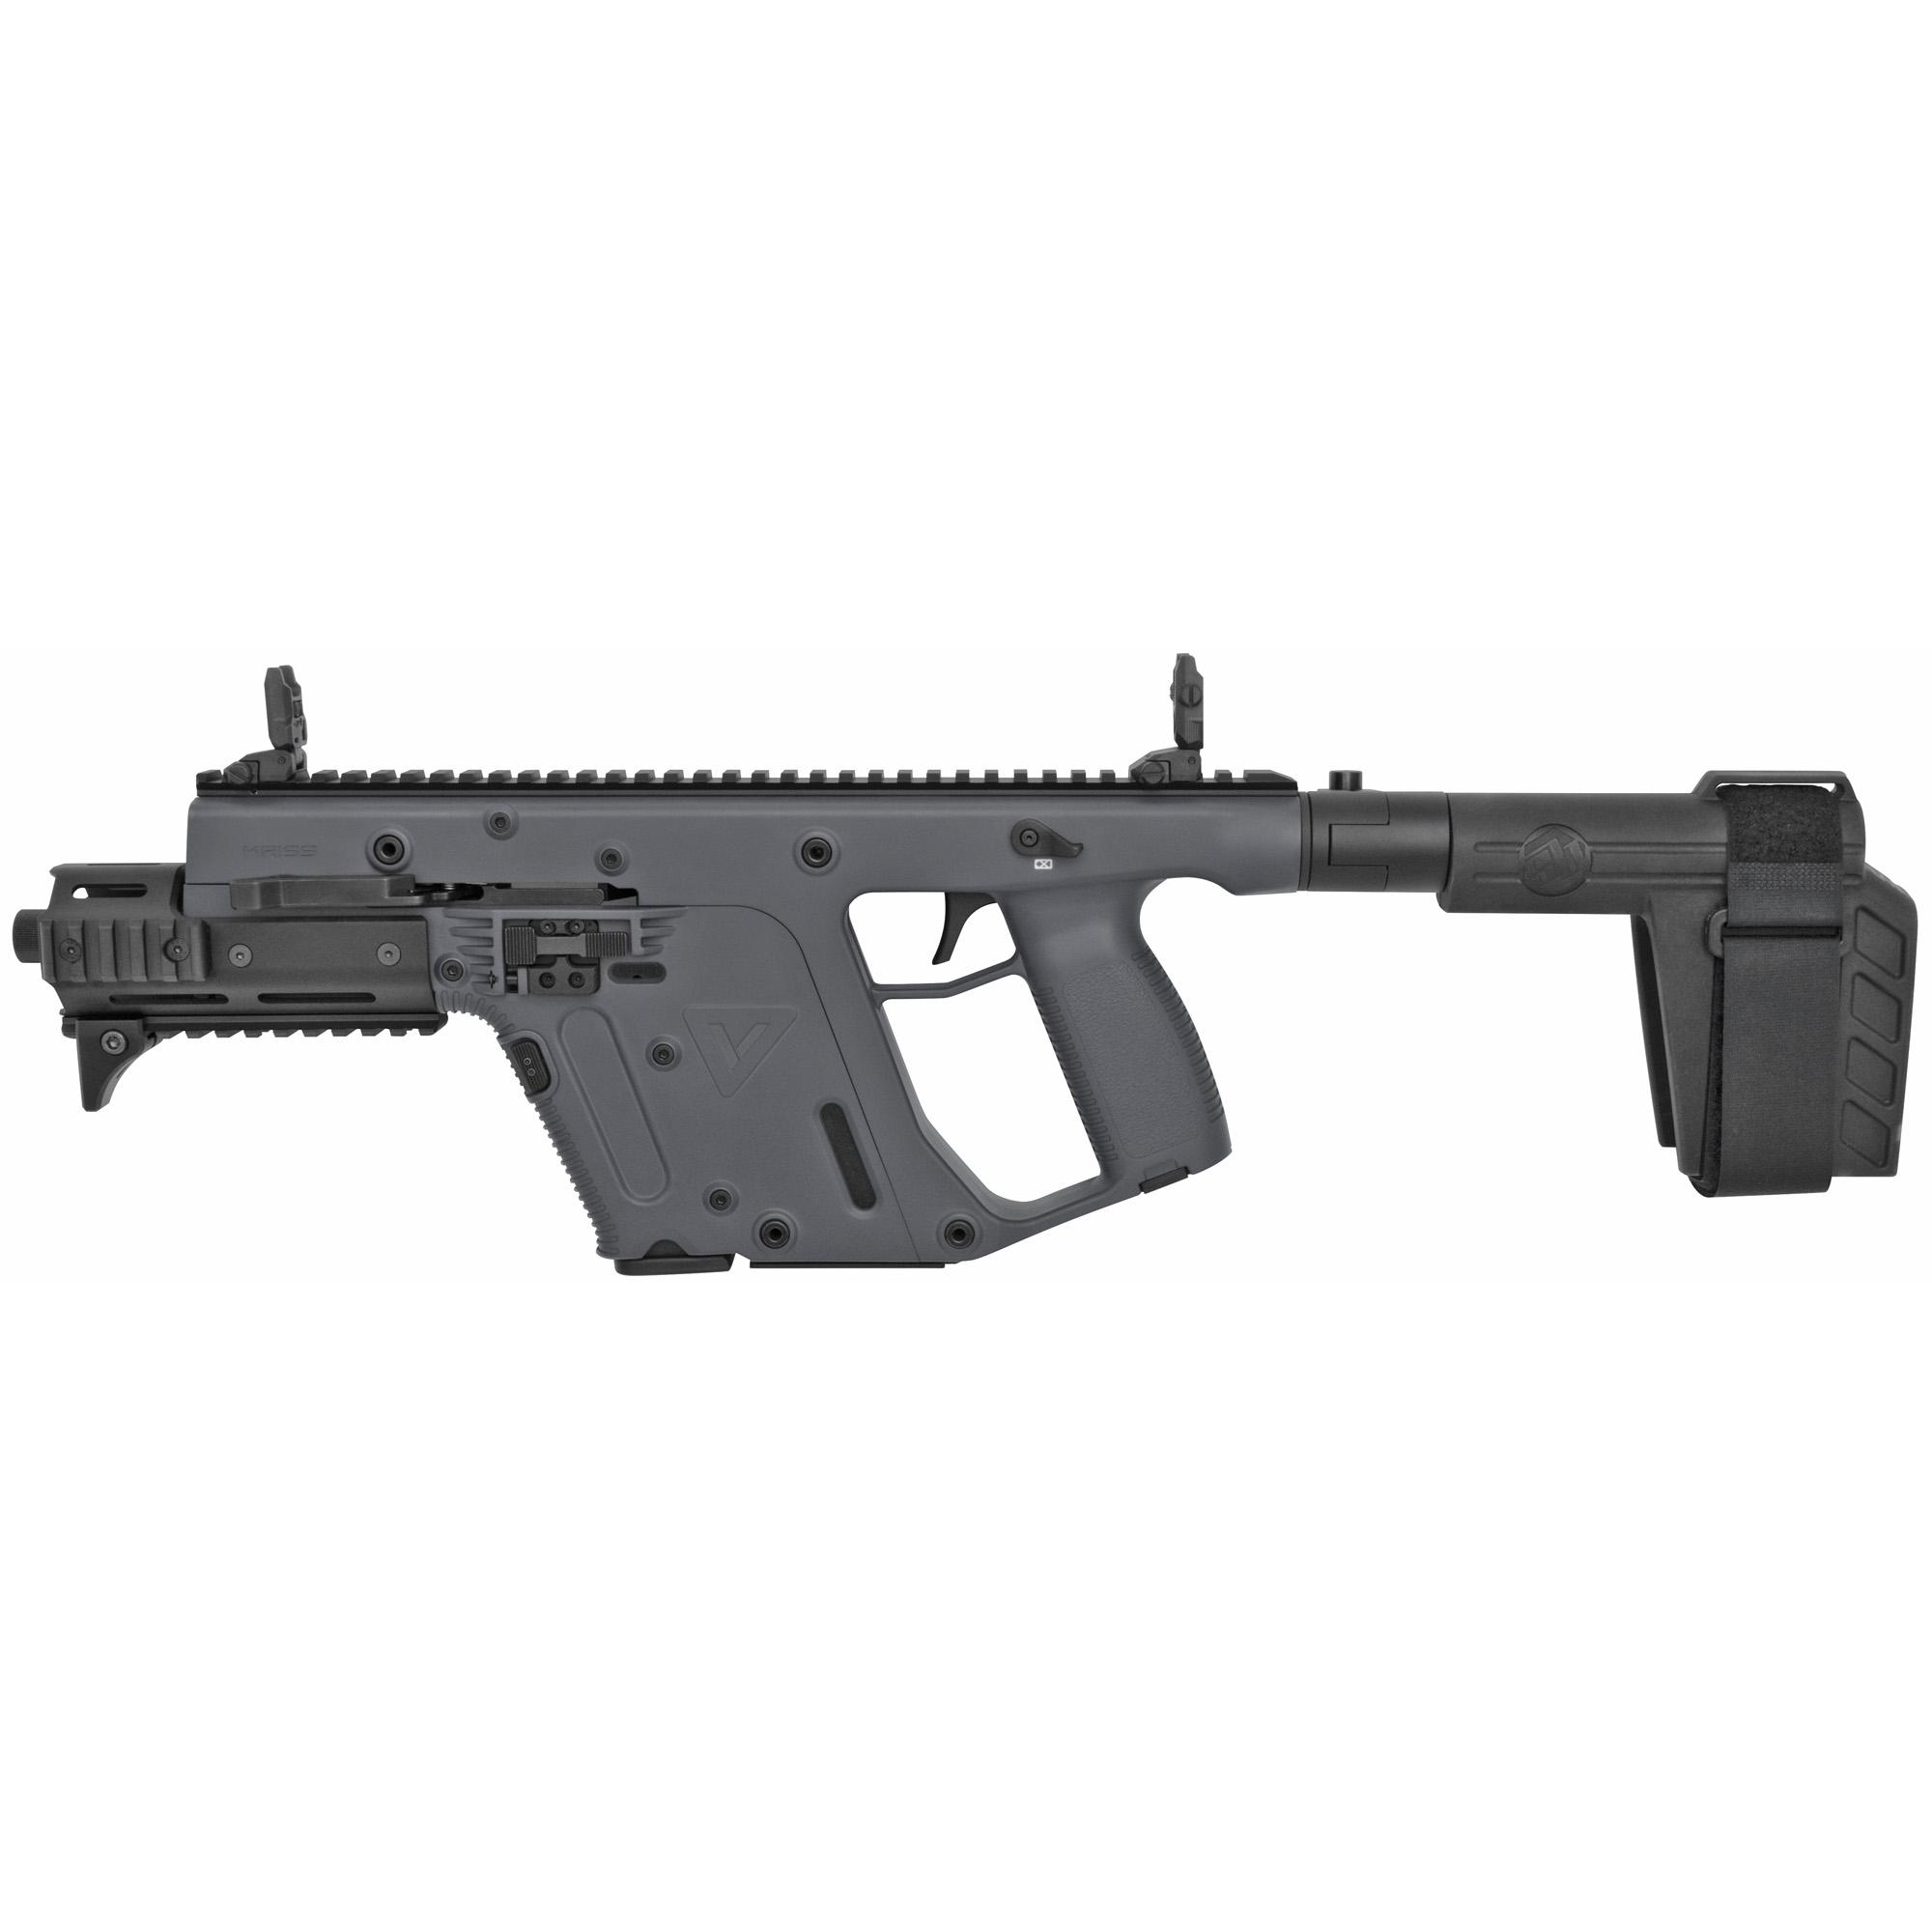 "Kriss Vector Sdp Sbxk 10mm 6.5"" Cgr-KRKV10-PSBCG31"